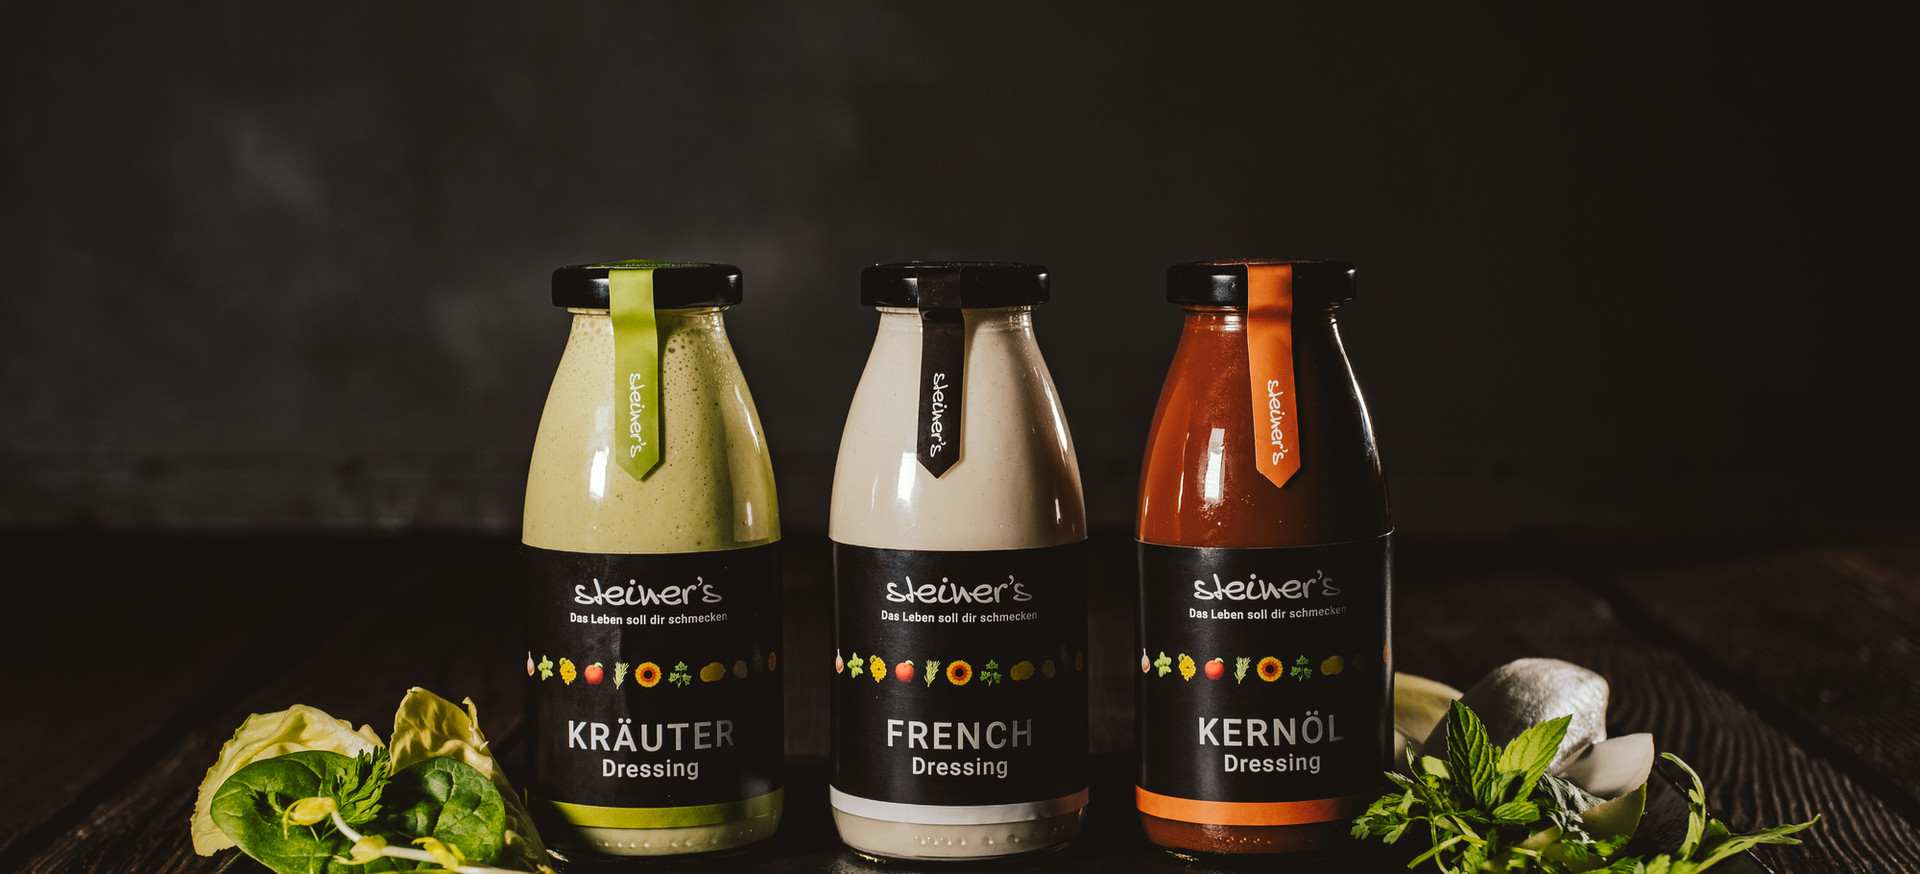 Steiners Salatdrassing - Produktfotos